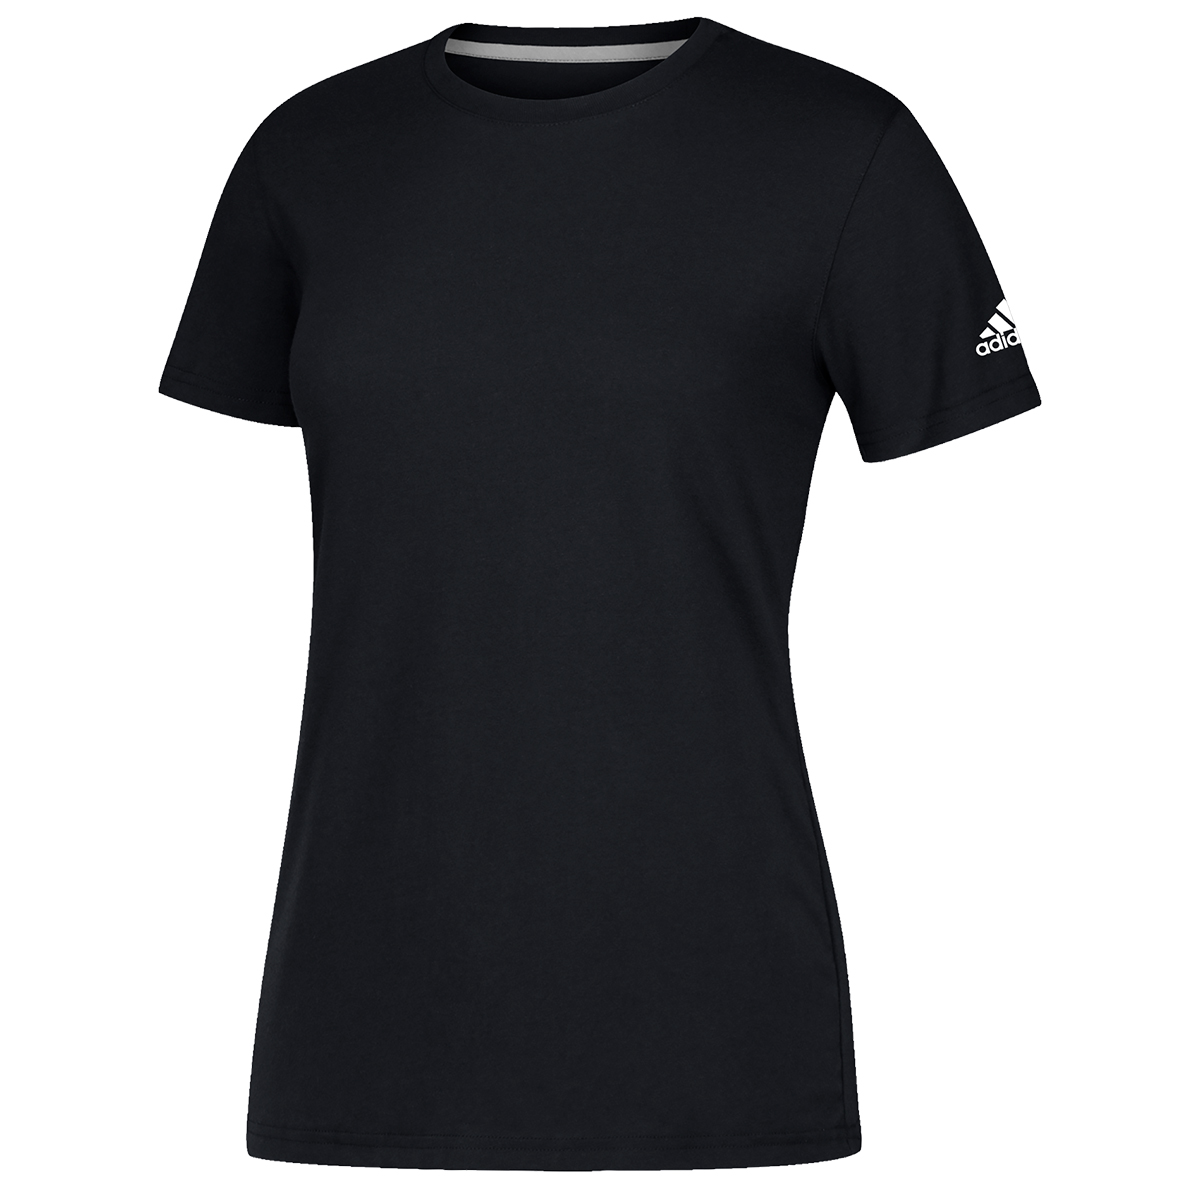 Adidas Women's Short-Sleeve Performance Crew Neck Tee - Black, 3XL